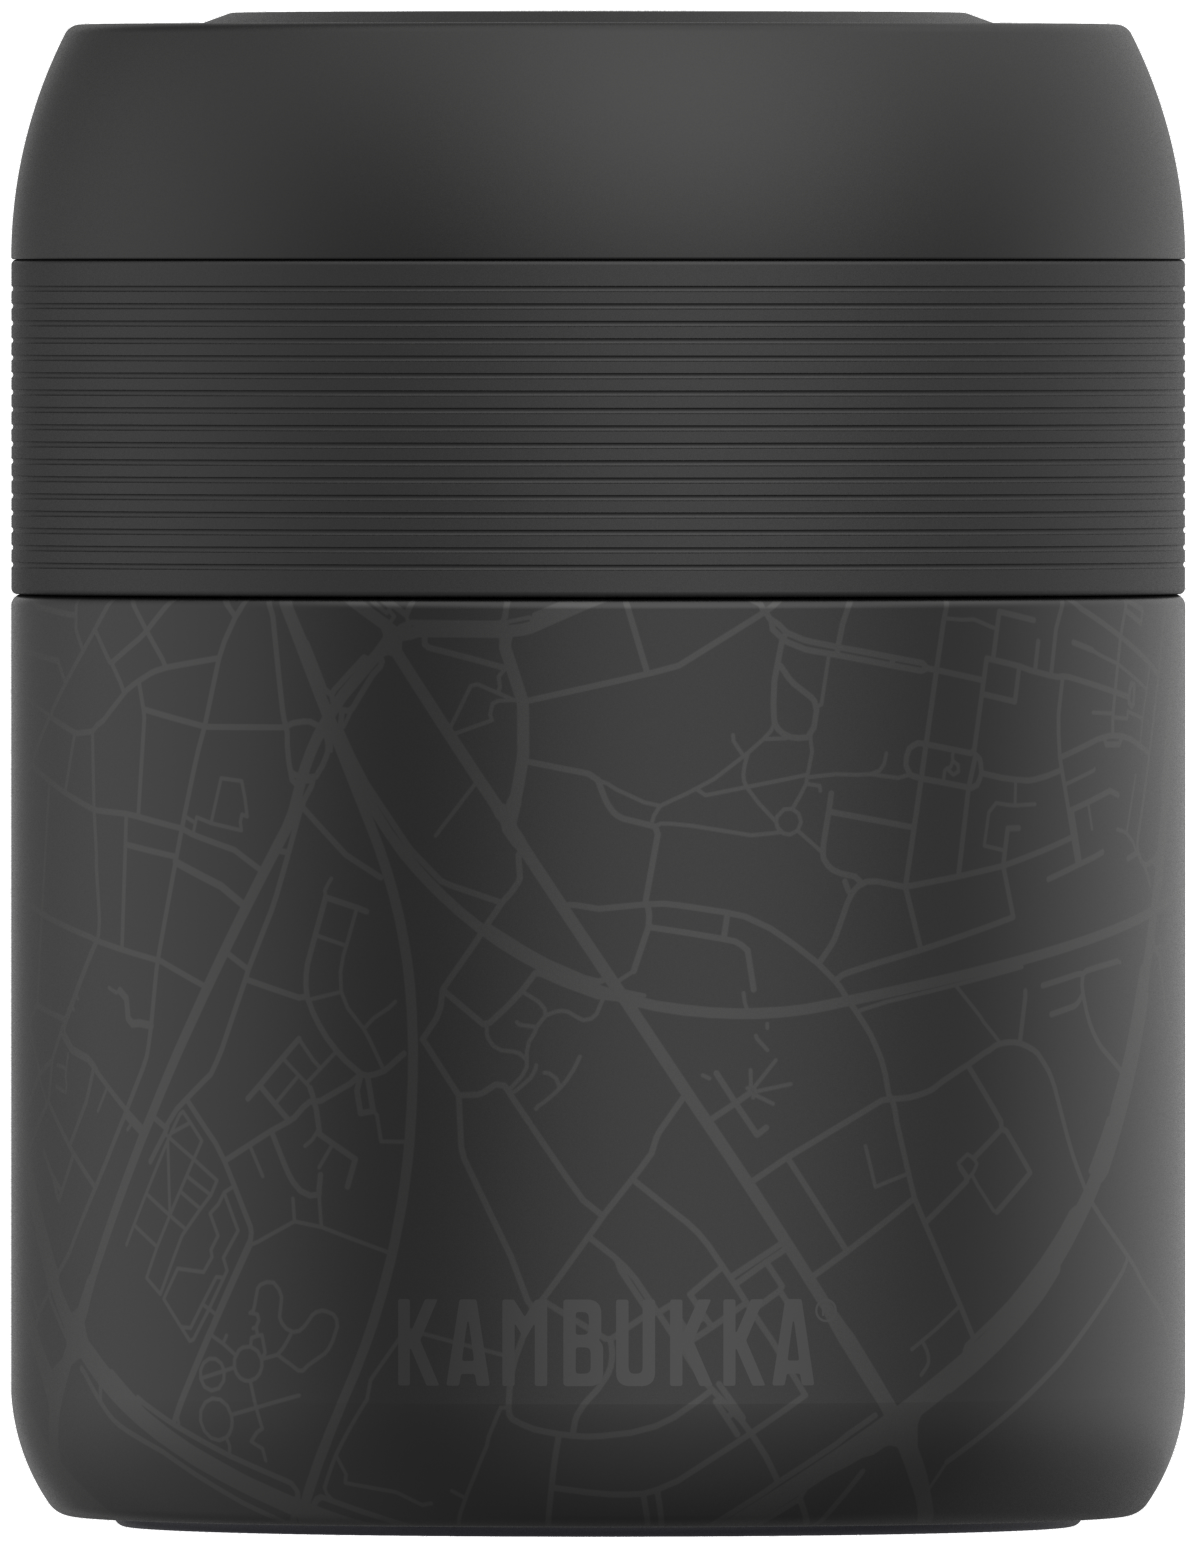 Termos obiadowy Kambukka Bora 600 ml - 100% Hasselt